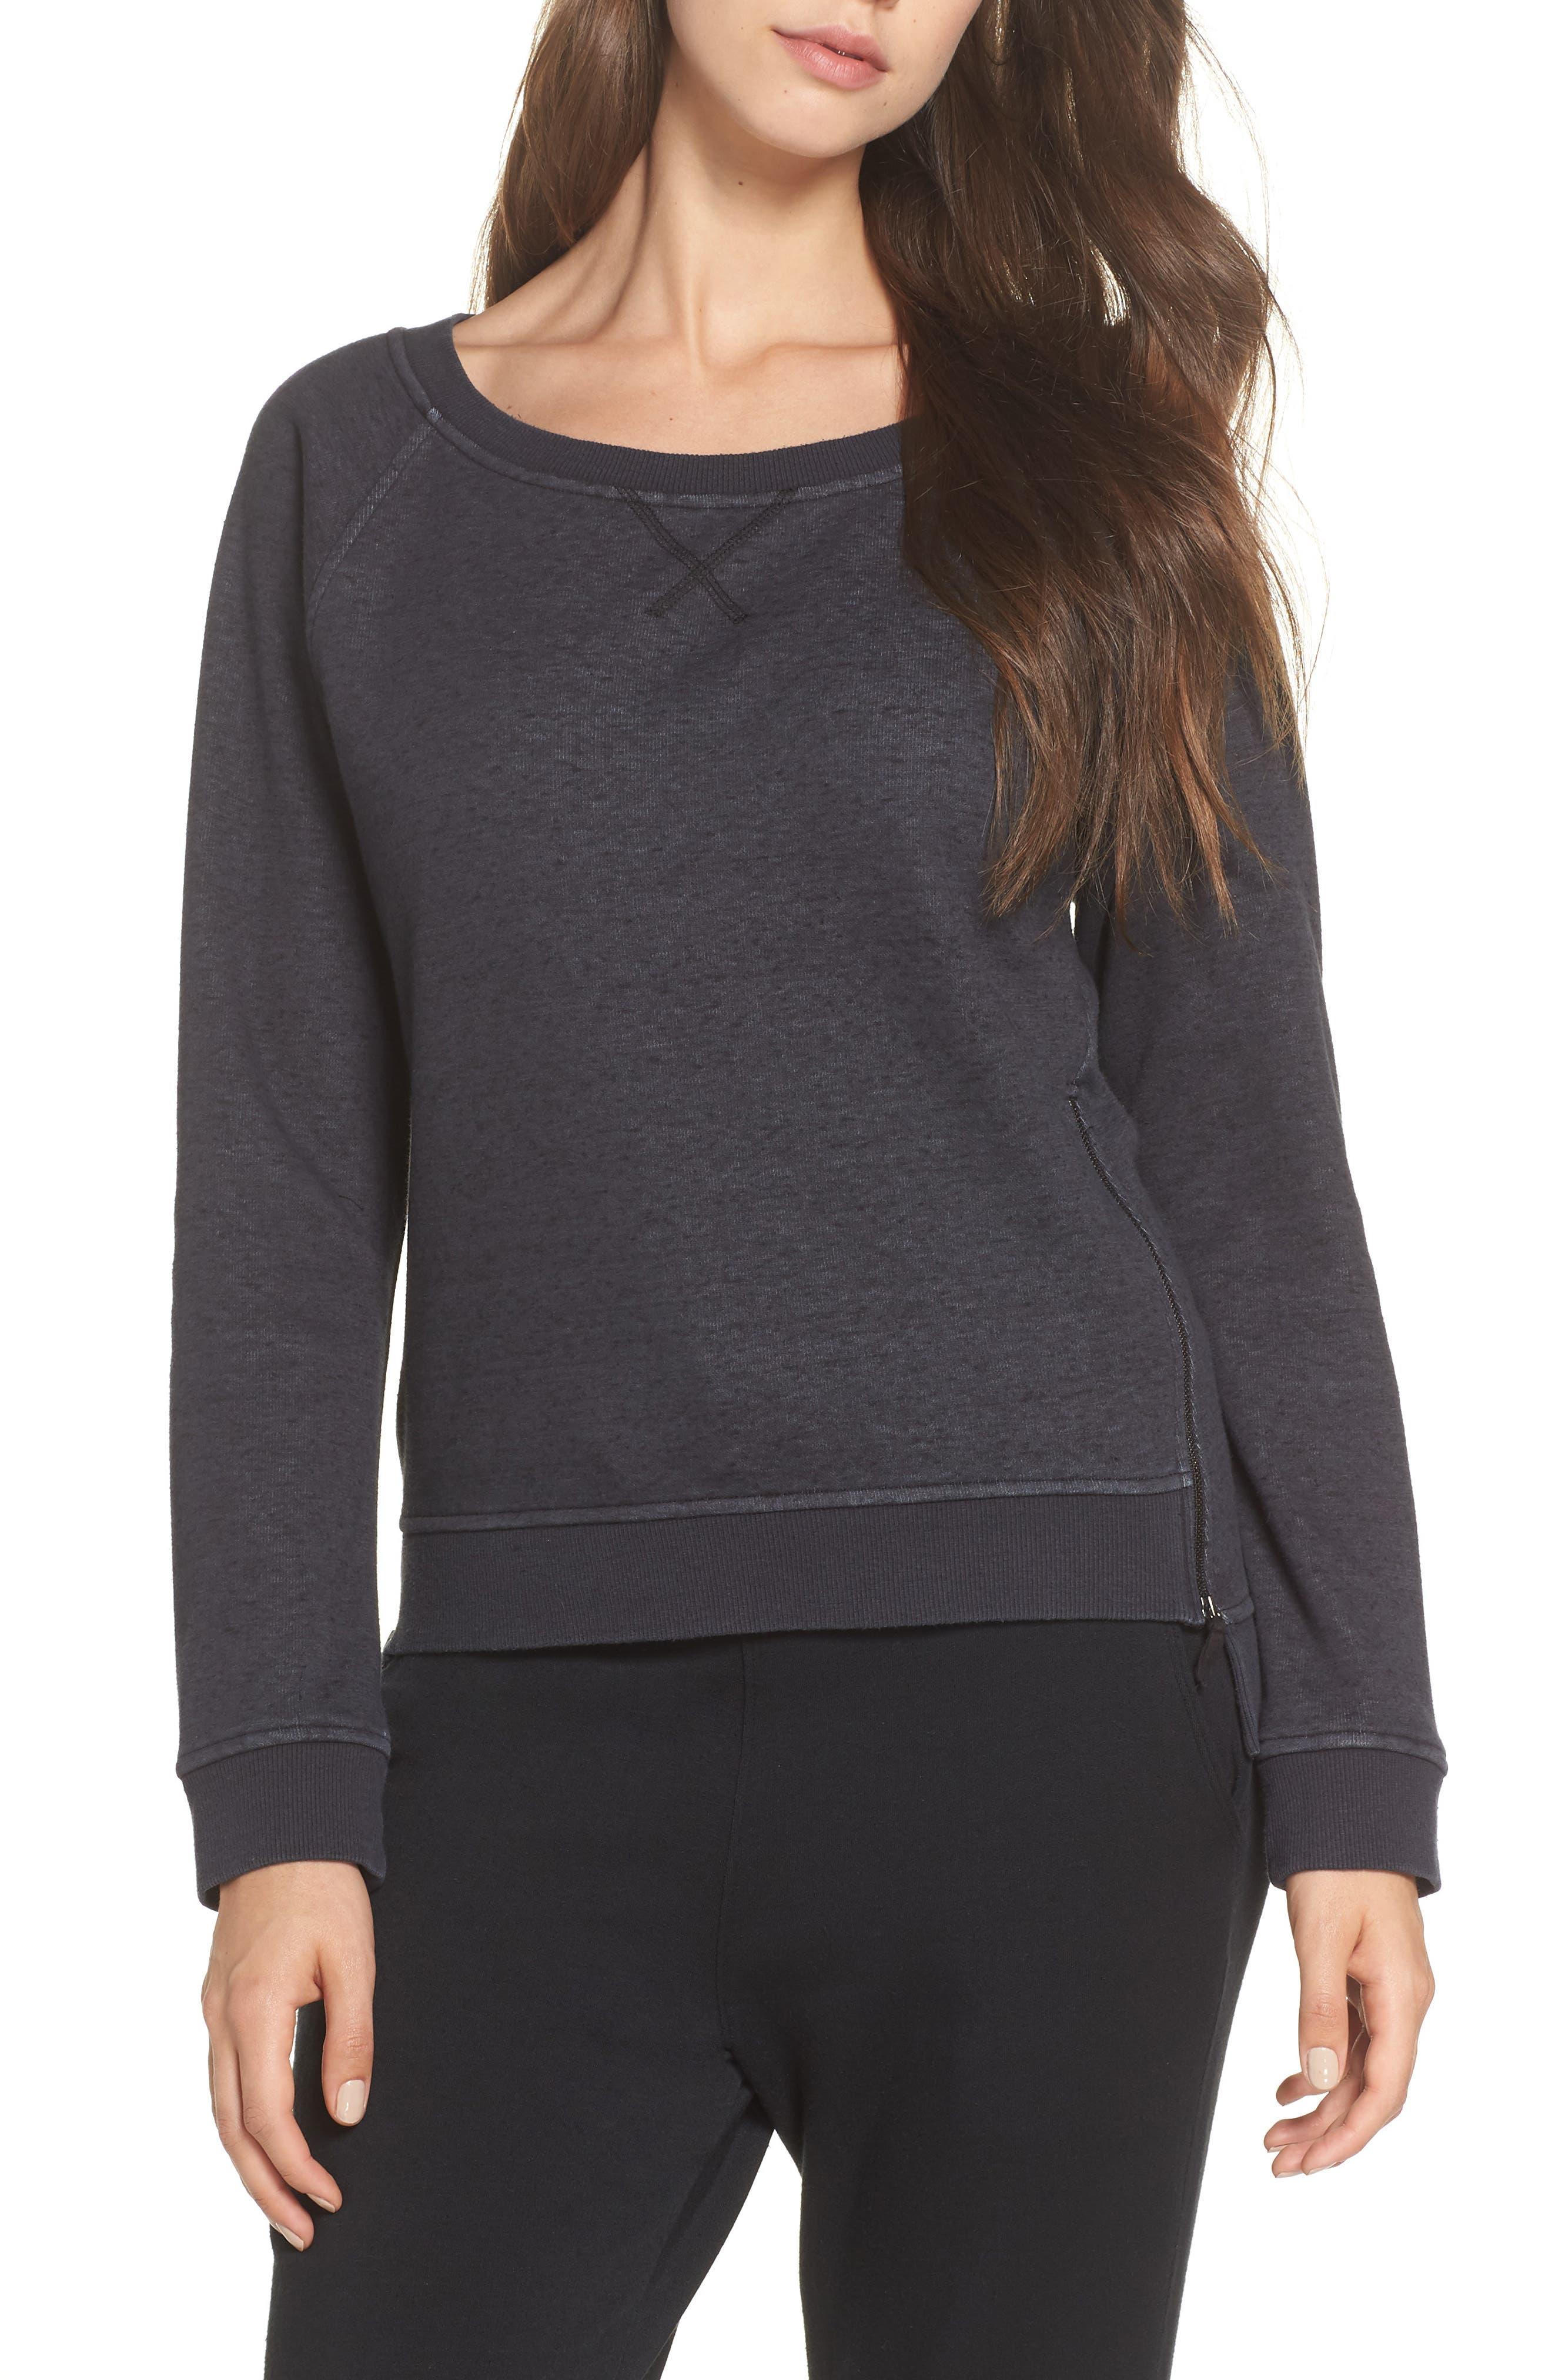 Morgan Sweatshirt,                             Main thumbnail 1, color,                             BLACK HEATHER